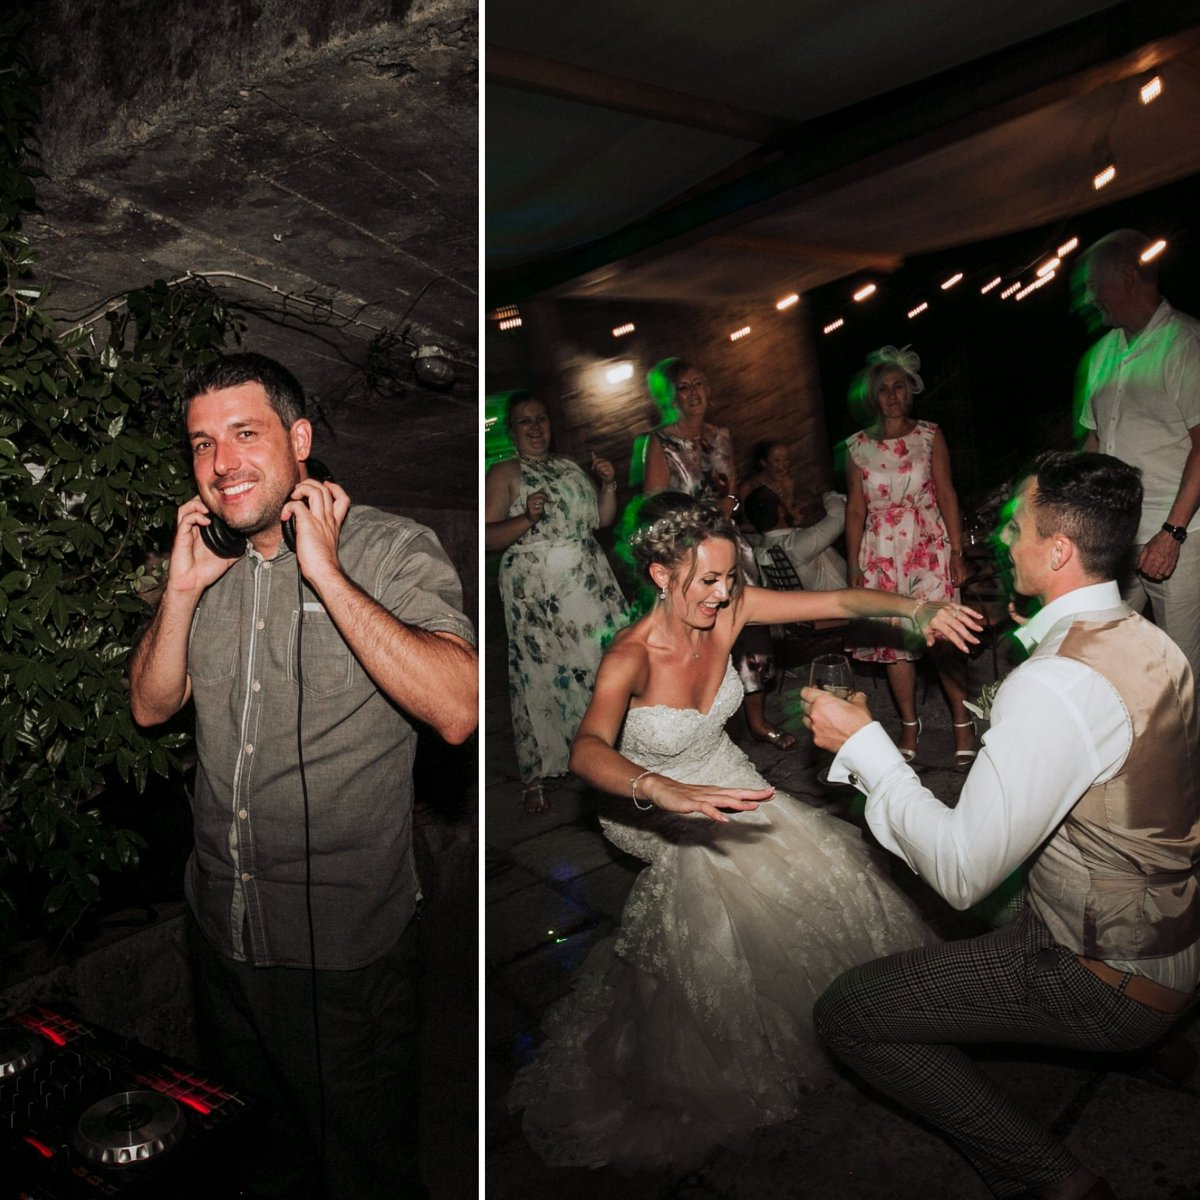 #koracevakuca #gruda #konavle #wedding #season #party #venue #weddingday #weddingvenue #weddingparty #weddingplanner #dubrovnikdestination #destinationwedding#britishwedding #weddingabroad #dj #dubrovnikdj #croatiandj #weddingdj #dubrovnikweddingdj #elopement #dubrovnik #croatia